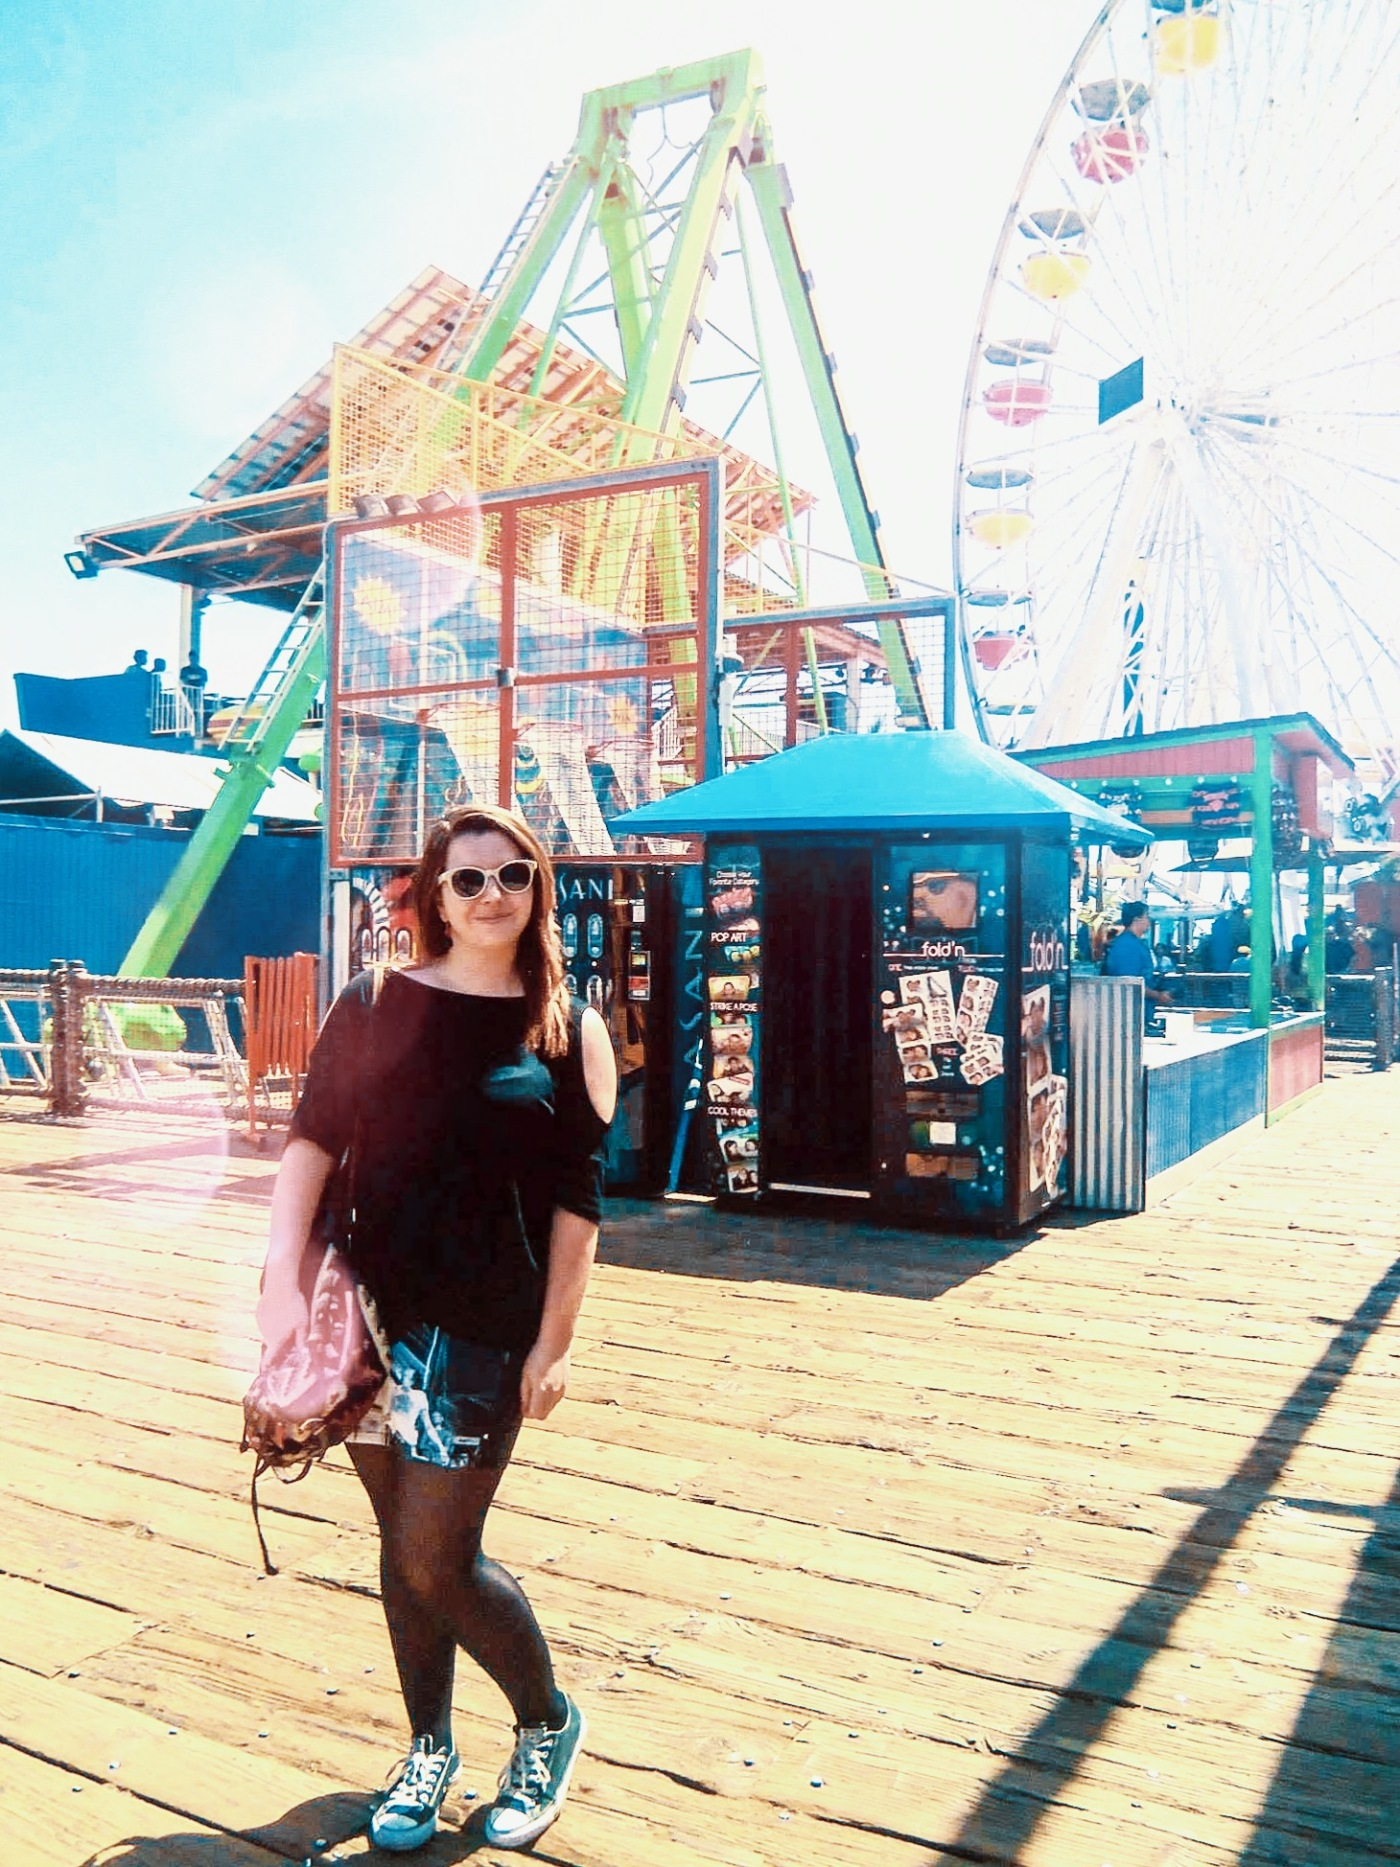 Standing alone on Santa Monica Pier